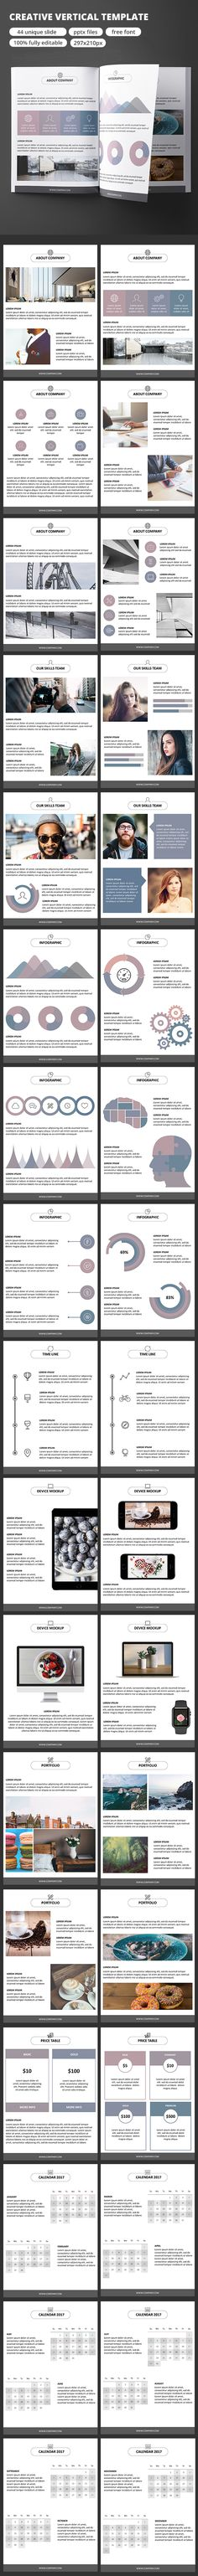 Creative Vertical  GoogleSlide Template — Google Slides PPTX #entrepreneur #analysis • Download ➝ https://graphicriver.net/item/creative-vertical-googleslide-template/18782076?ref=pxcr